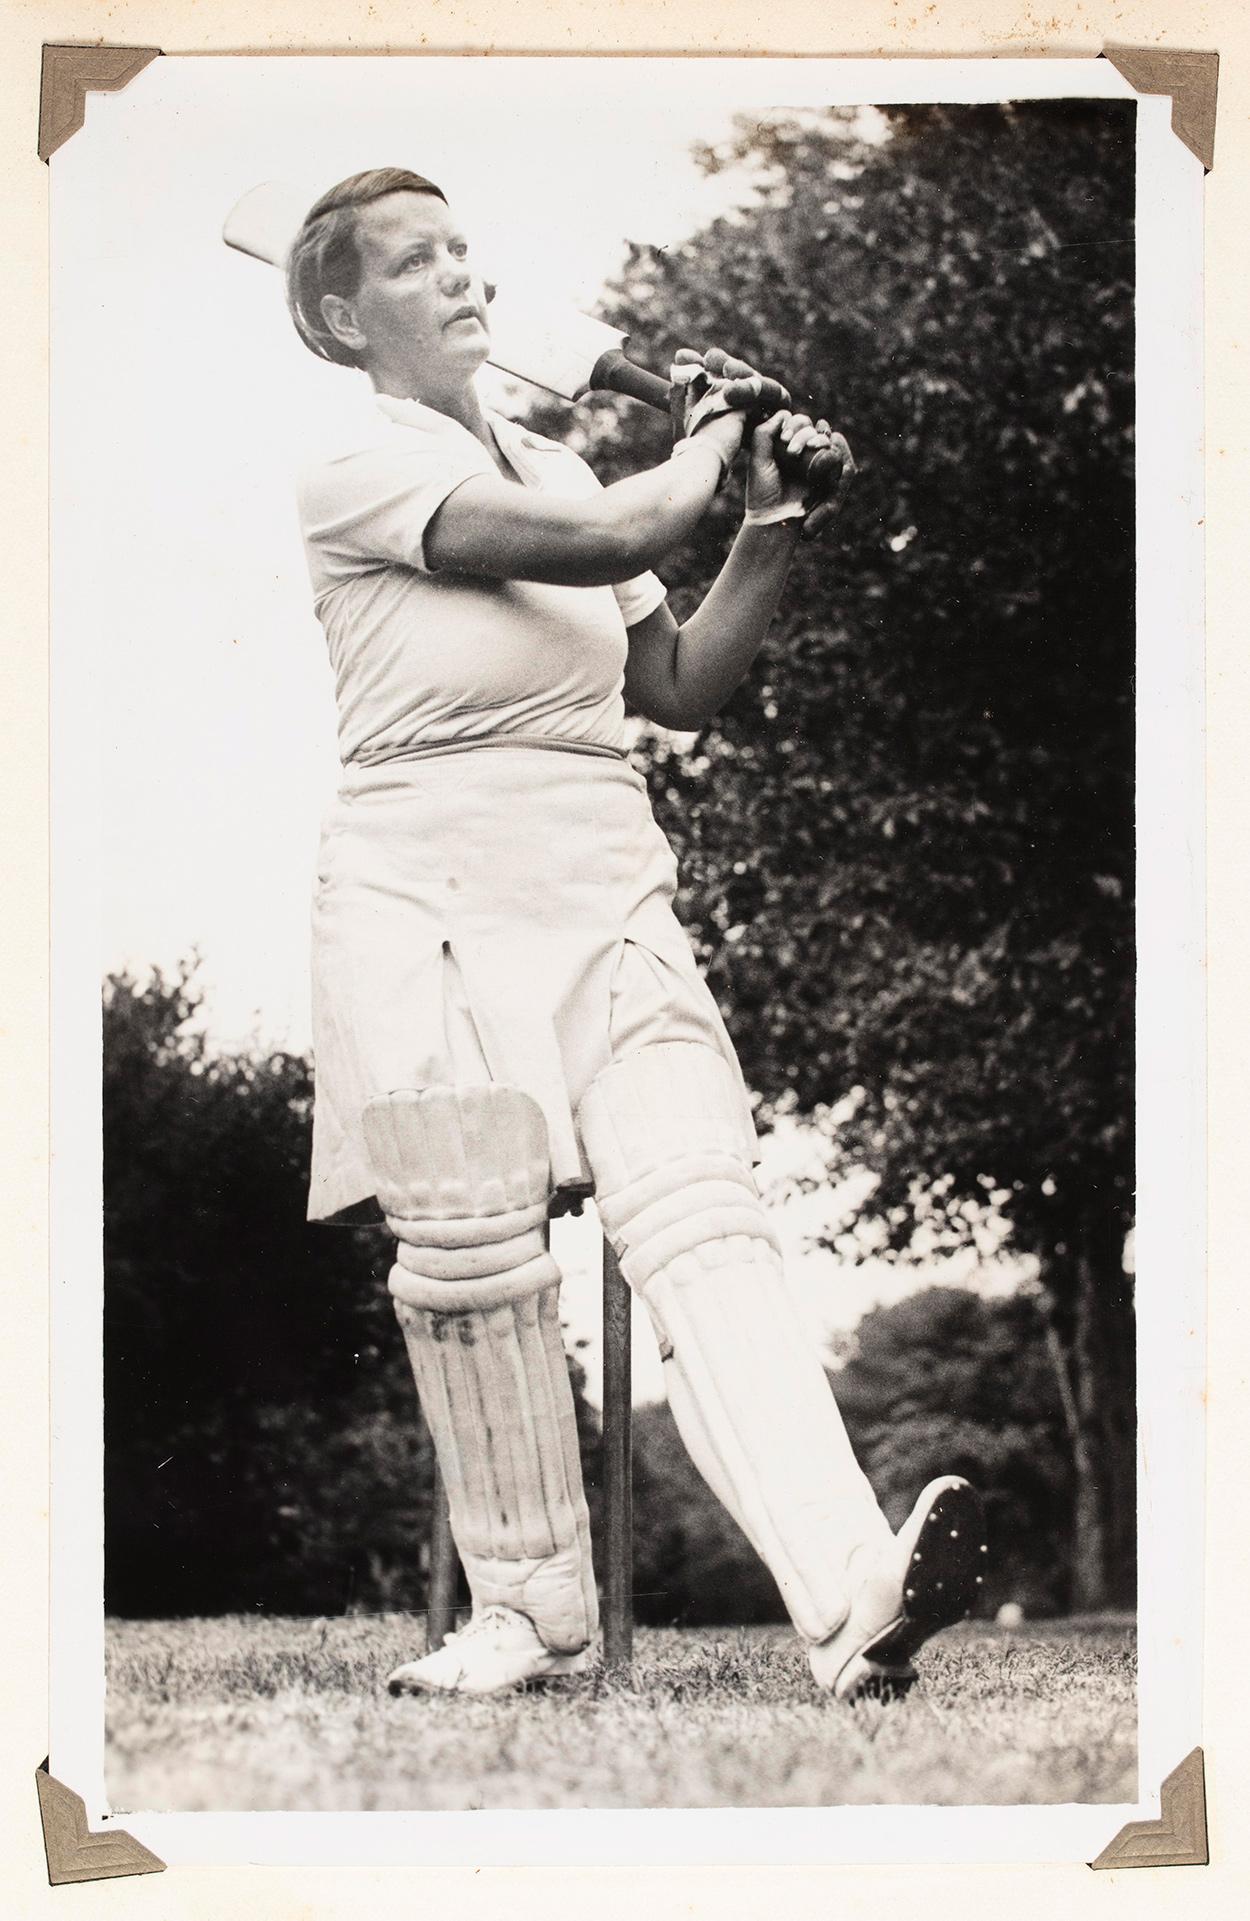 A woman in cricket uniform, swinging a cricket bat.